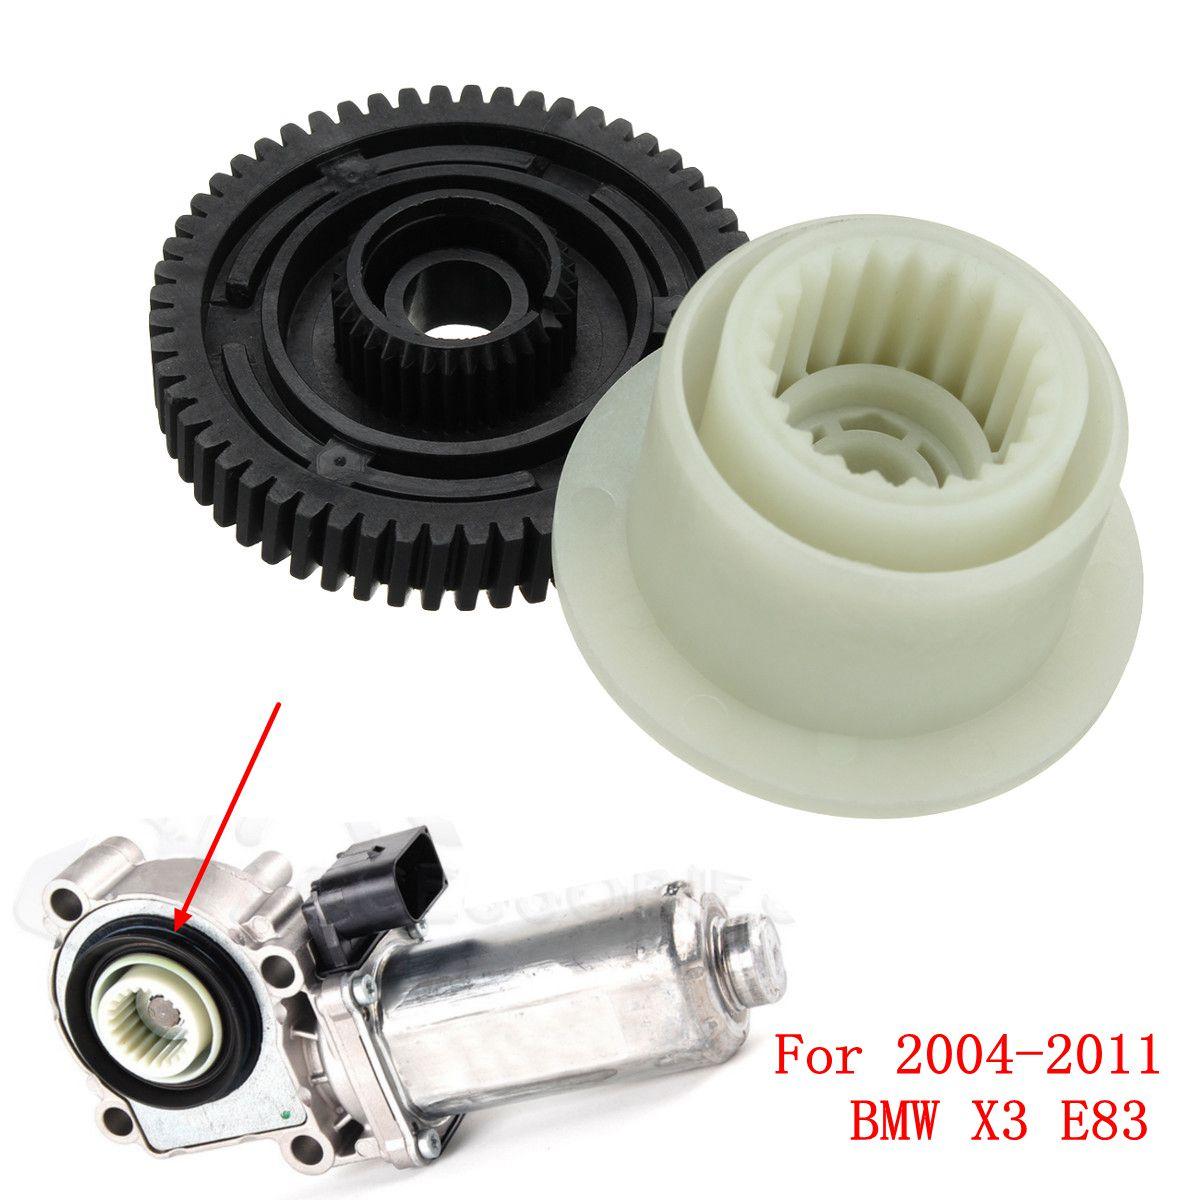 2 stücke Getriebe Box Transfer Fall Servo Antrieb Motor Reparatur Kit Für BMW X3 E83 2004-2011